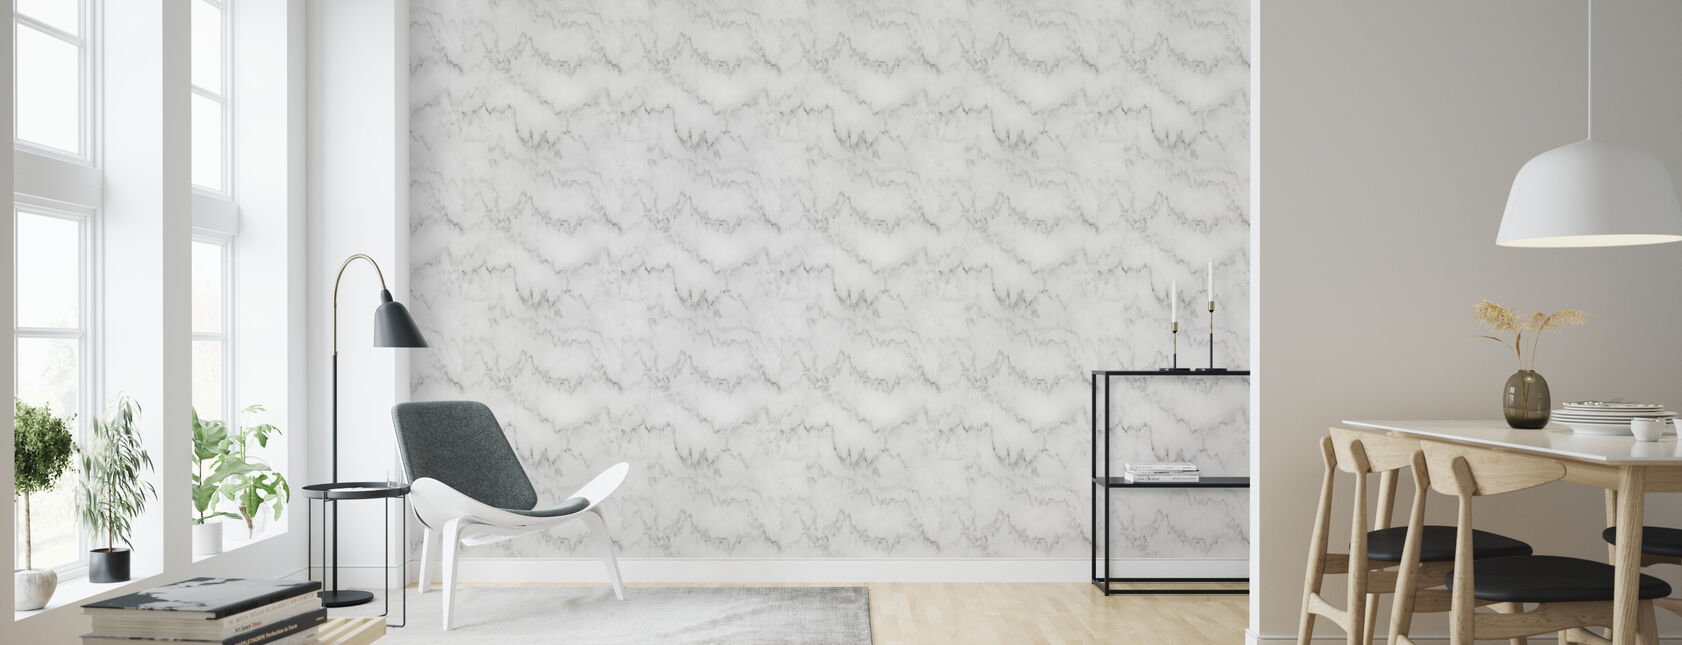 Marmer Carrara - Behang - Woonkamer